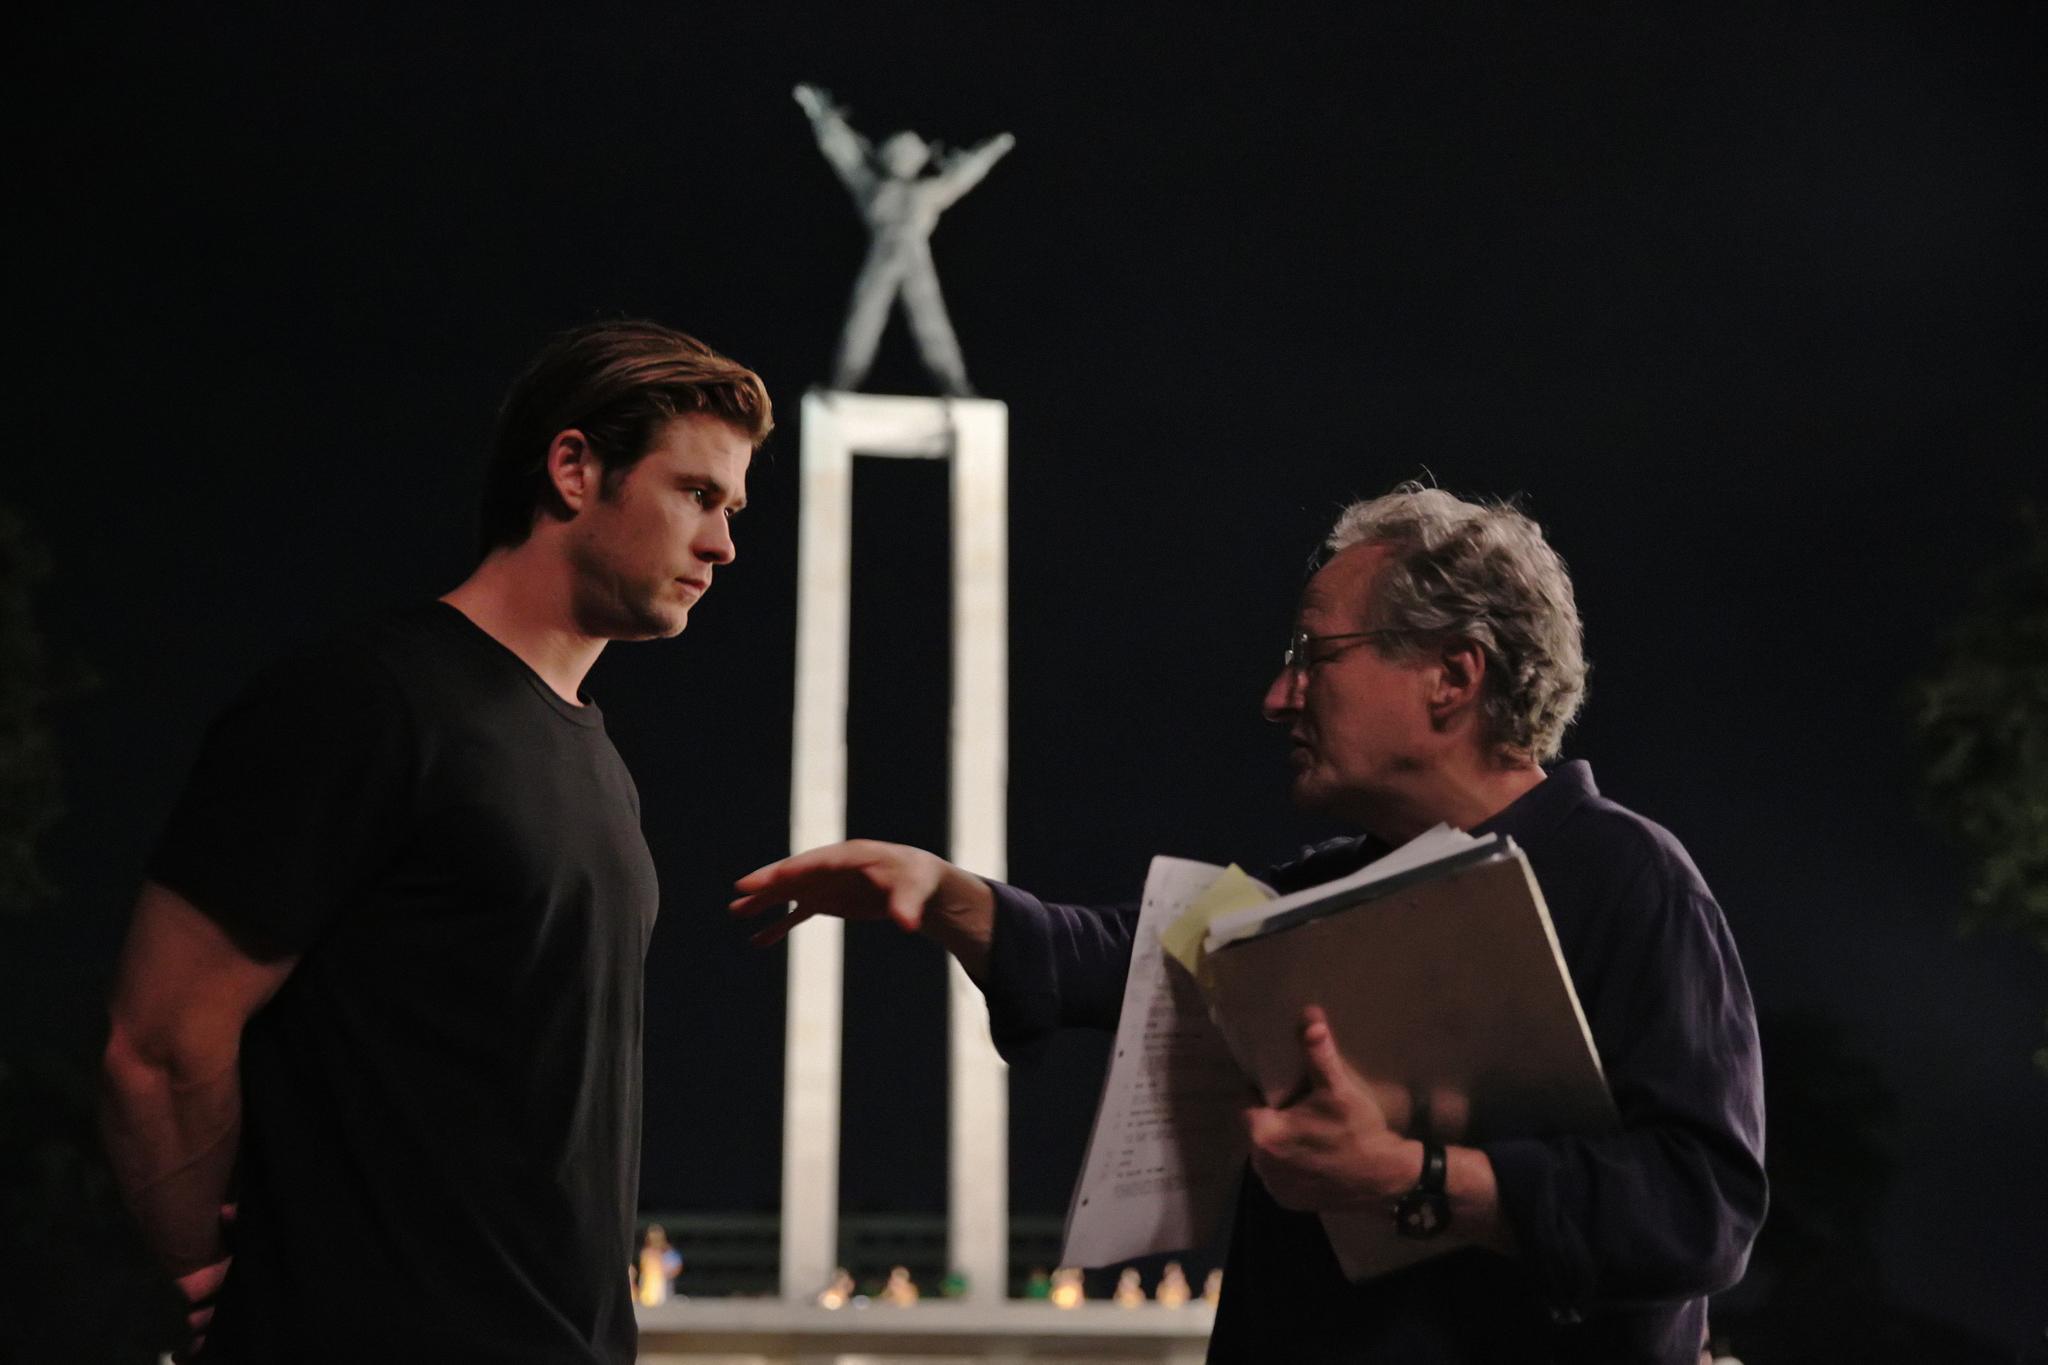 Michael Mann and Chris Hemsworth in Blackhat (2015)